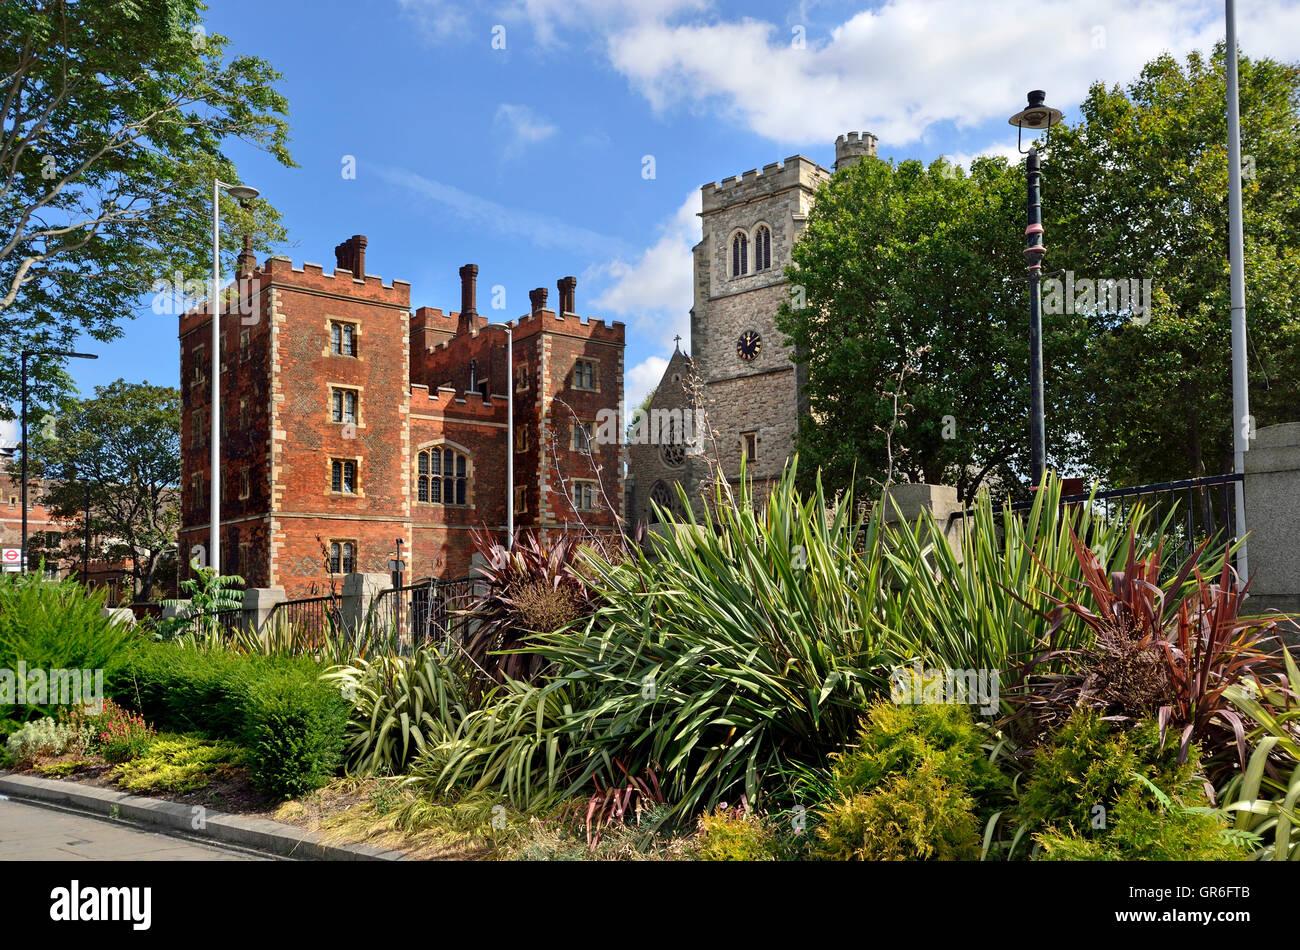 London, England, UK. Lambeth Palace - official residence of the Archbishop of Canterbury - Stock Image